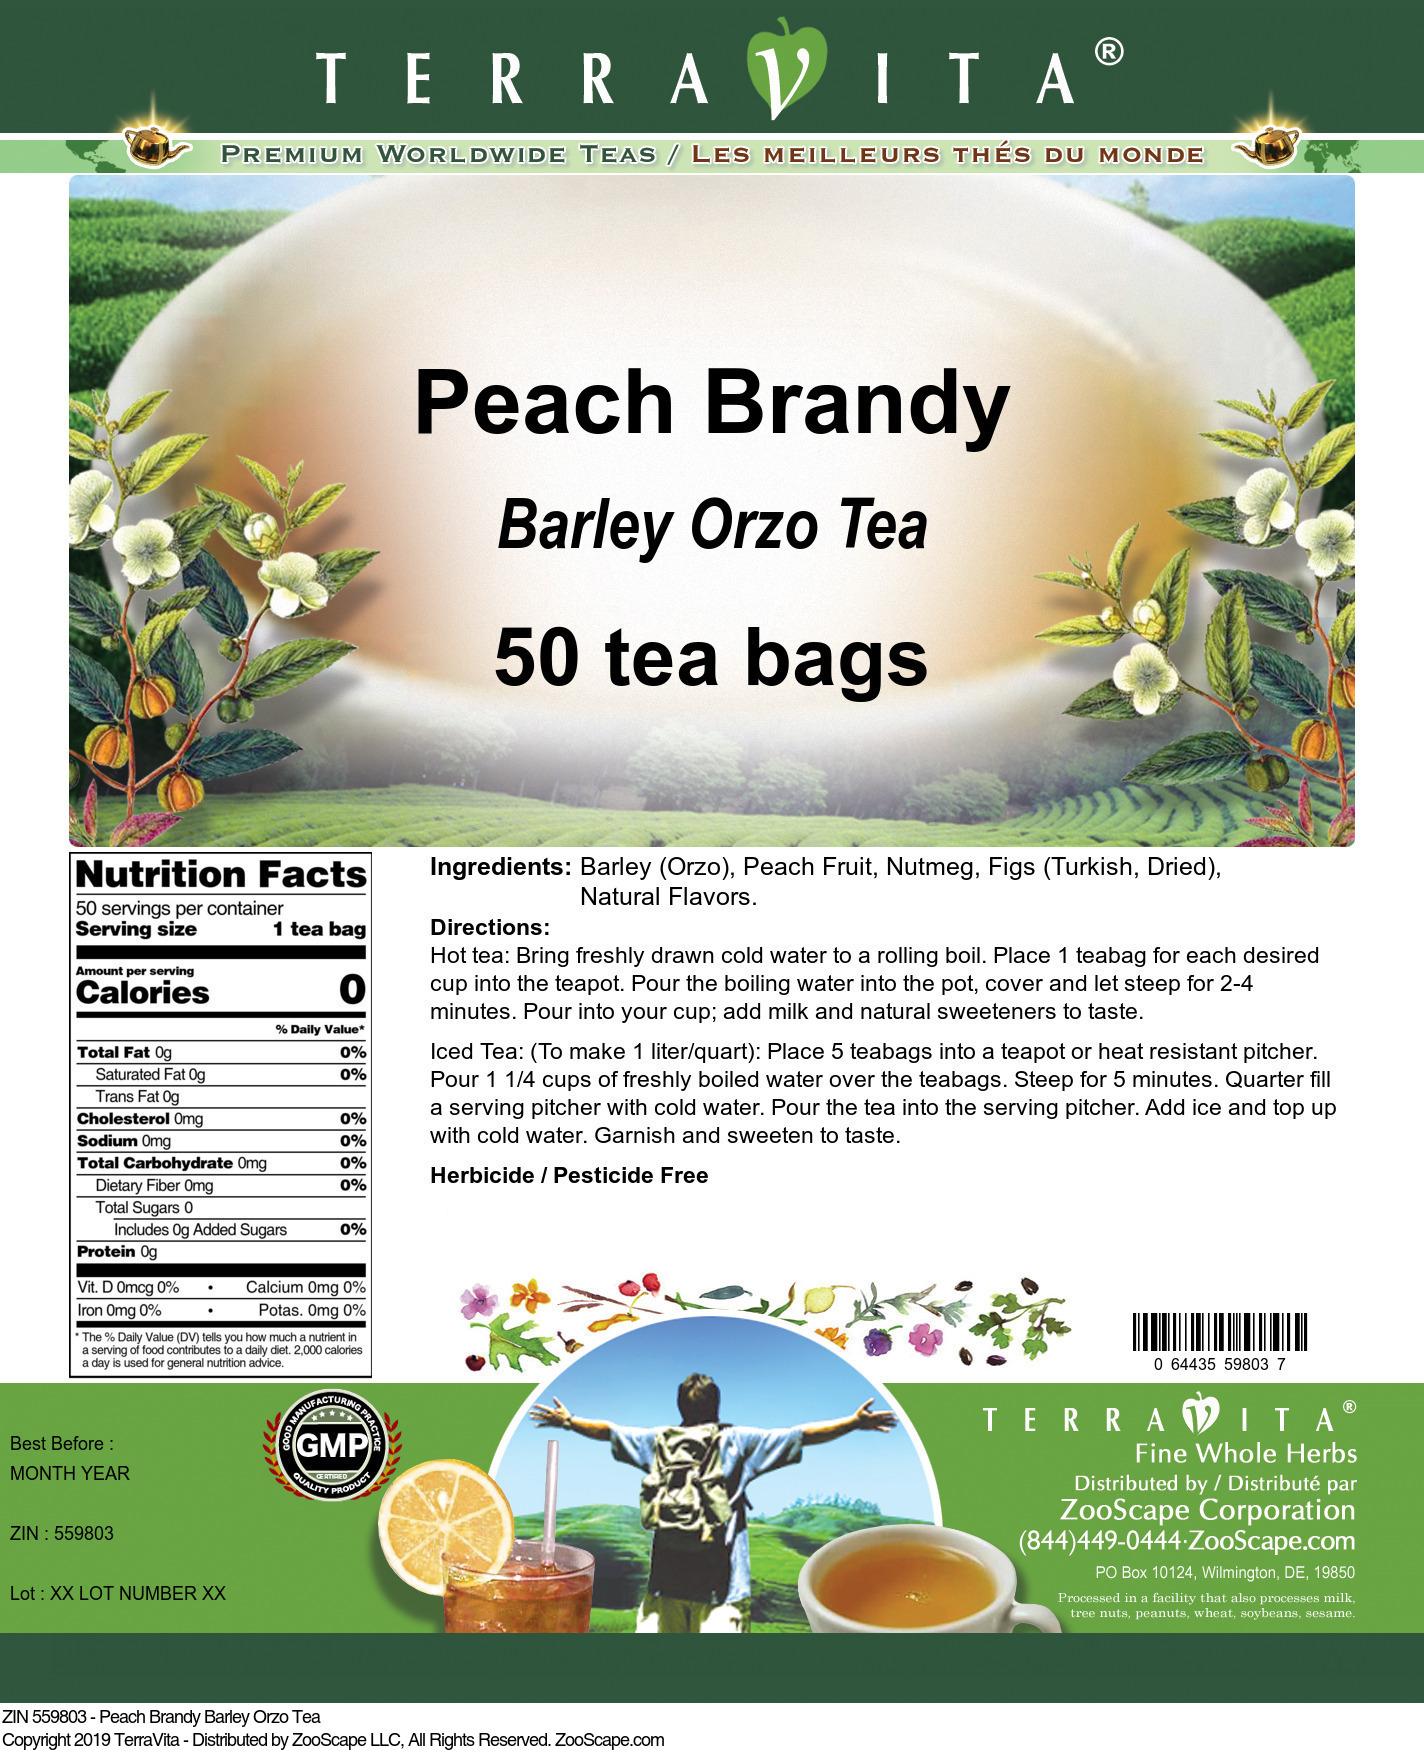 Peach Brandy Barley Orzo